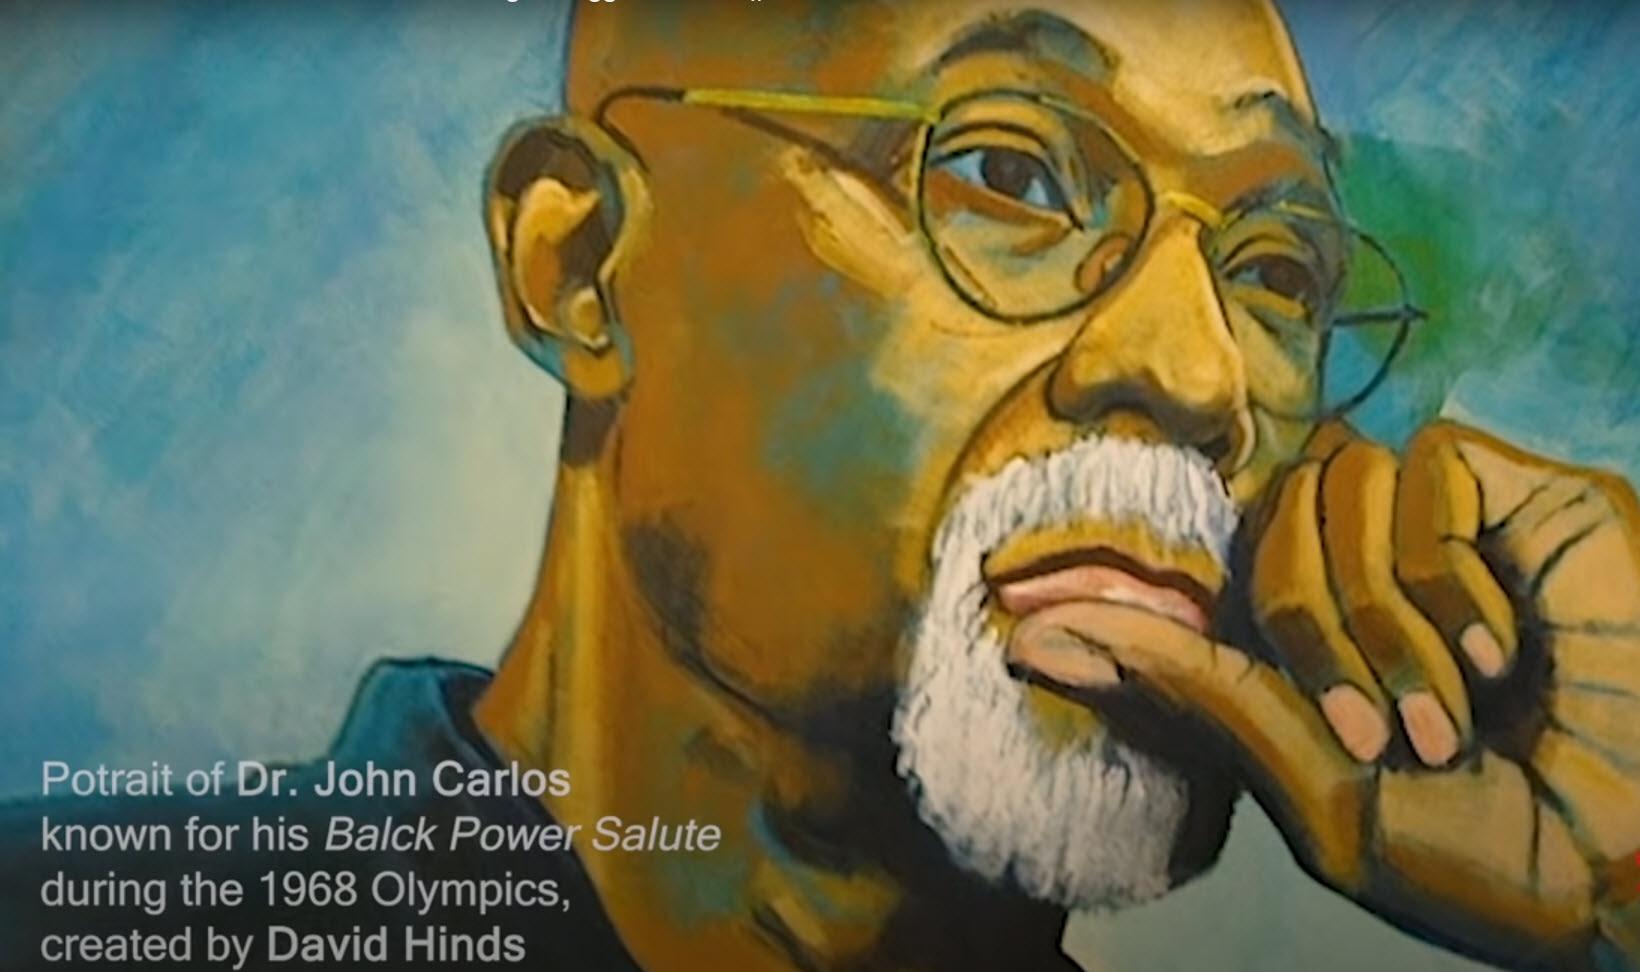 Dr. Johh Carlos portrait by David Hinds